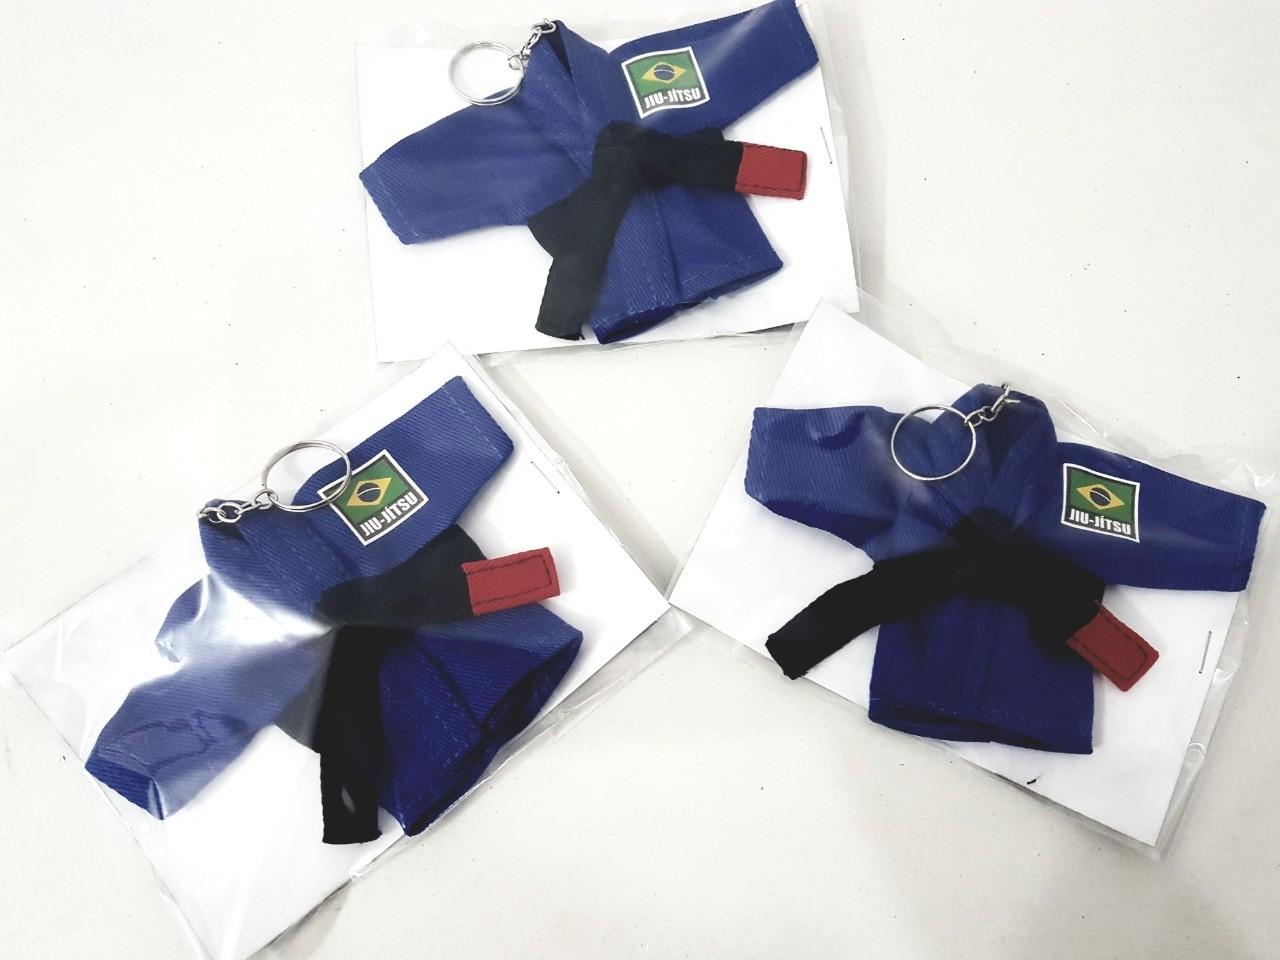 Mini Kimoninho Jiu Jitsu Azul Brasil  Combo 3 unidades